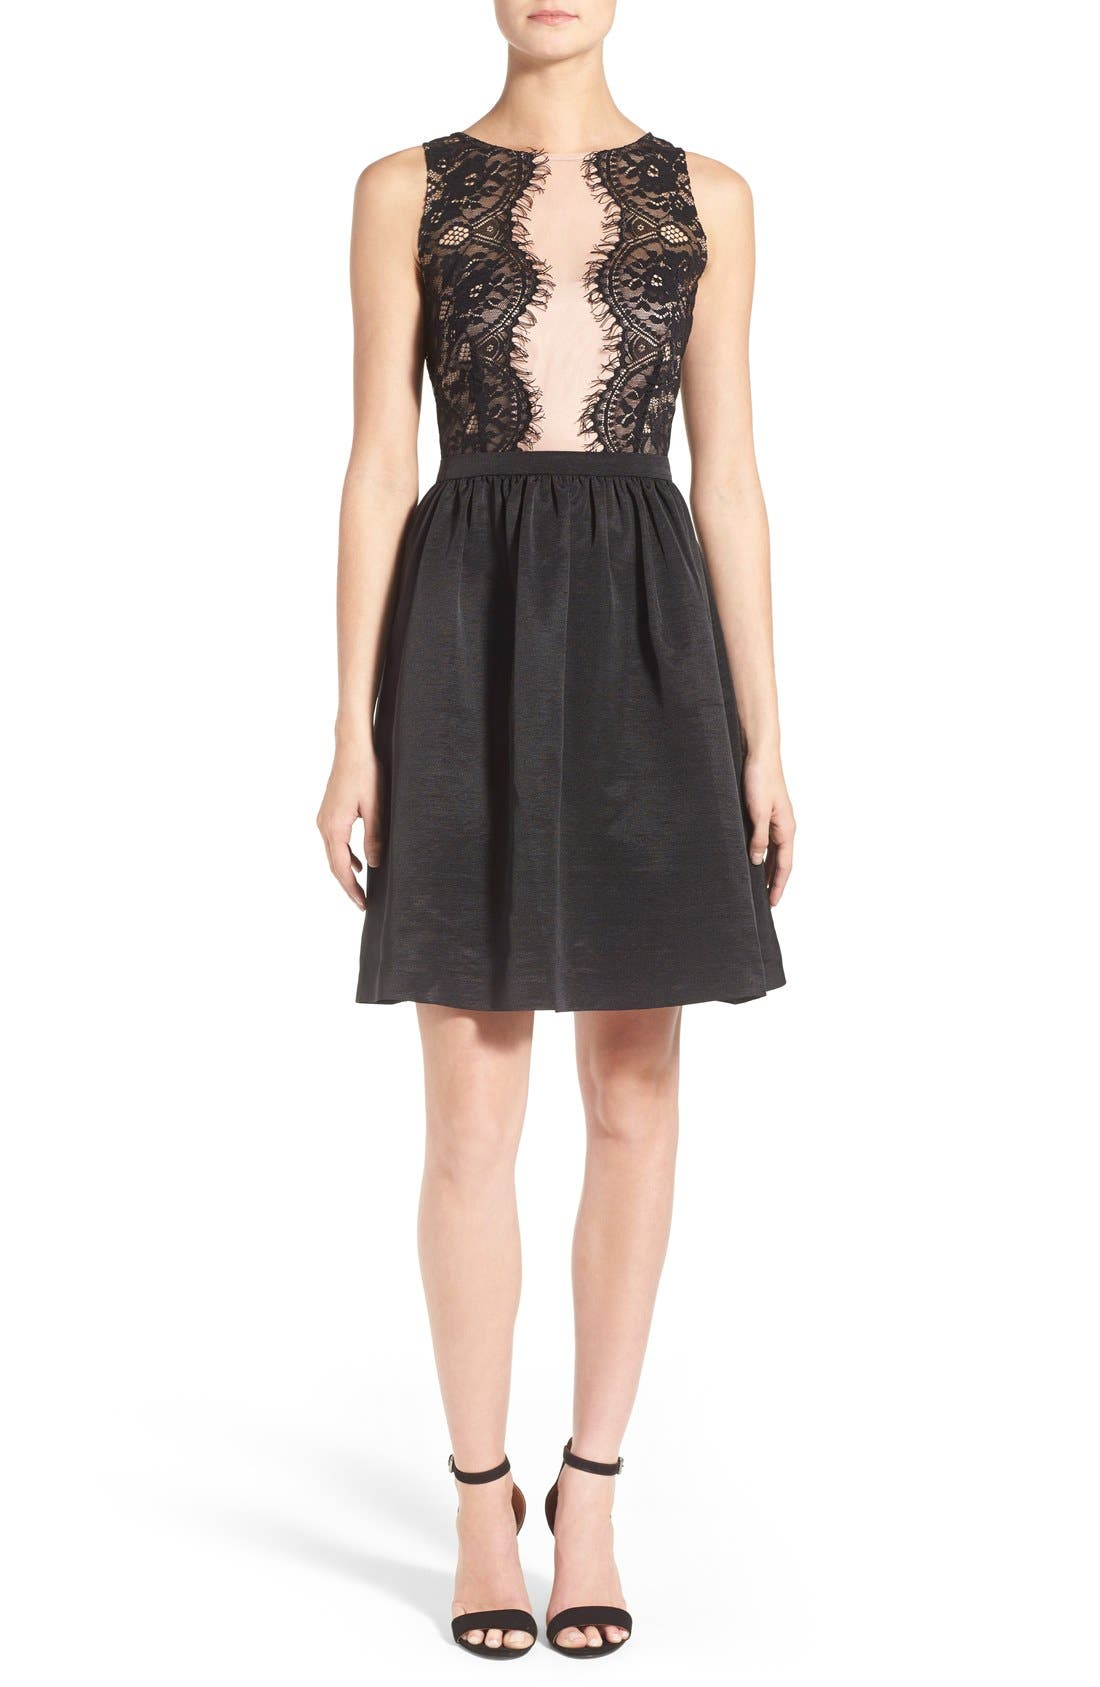 Alternate Image 1 Selected - Ivanka Trump Lace Dress